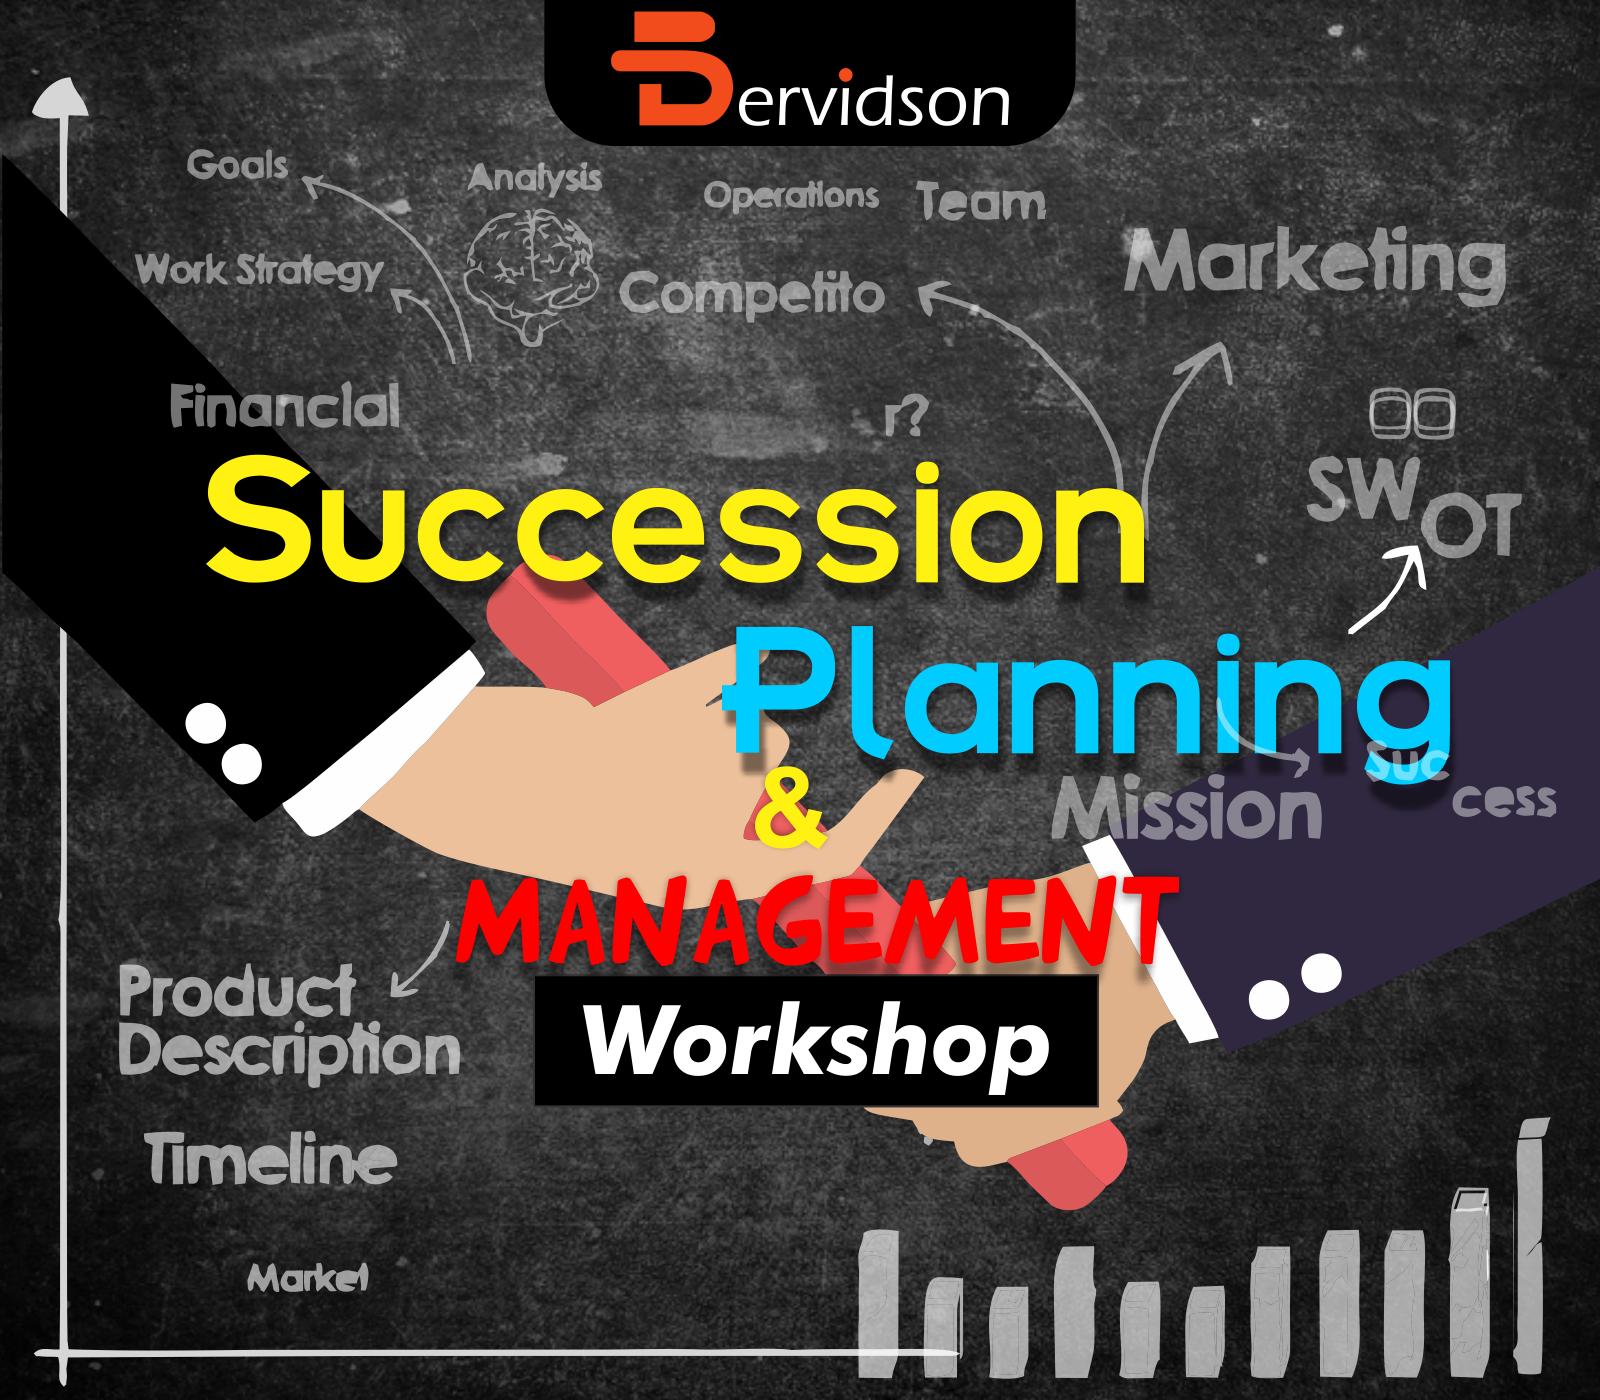 Succession Planning & Management Workshop